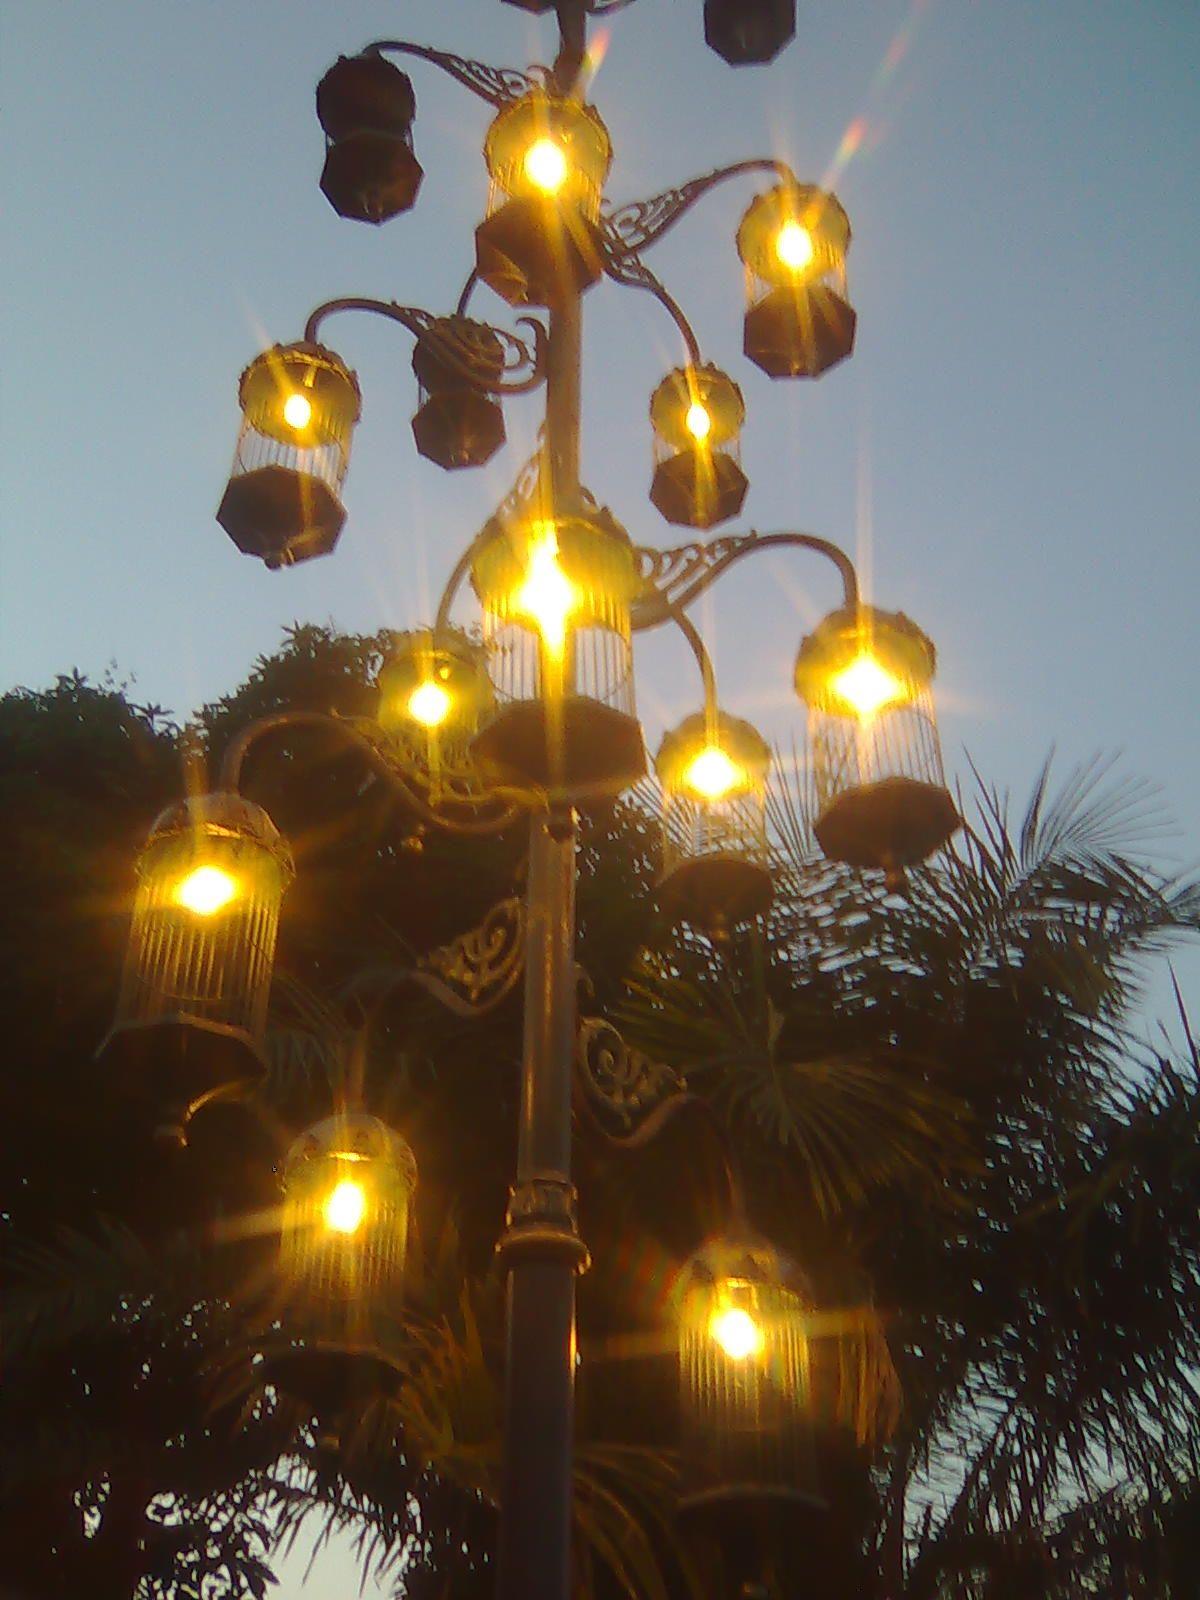 a lamps of Ngarsopuro pedestrian, Solo, Indonesia